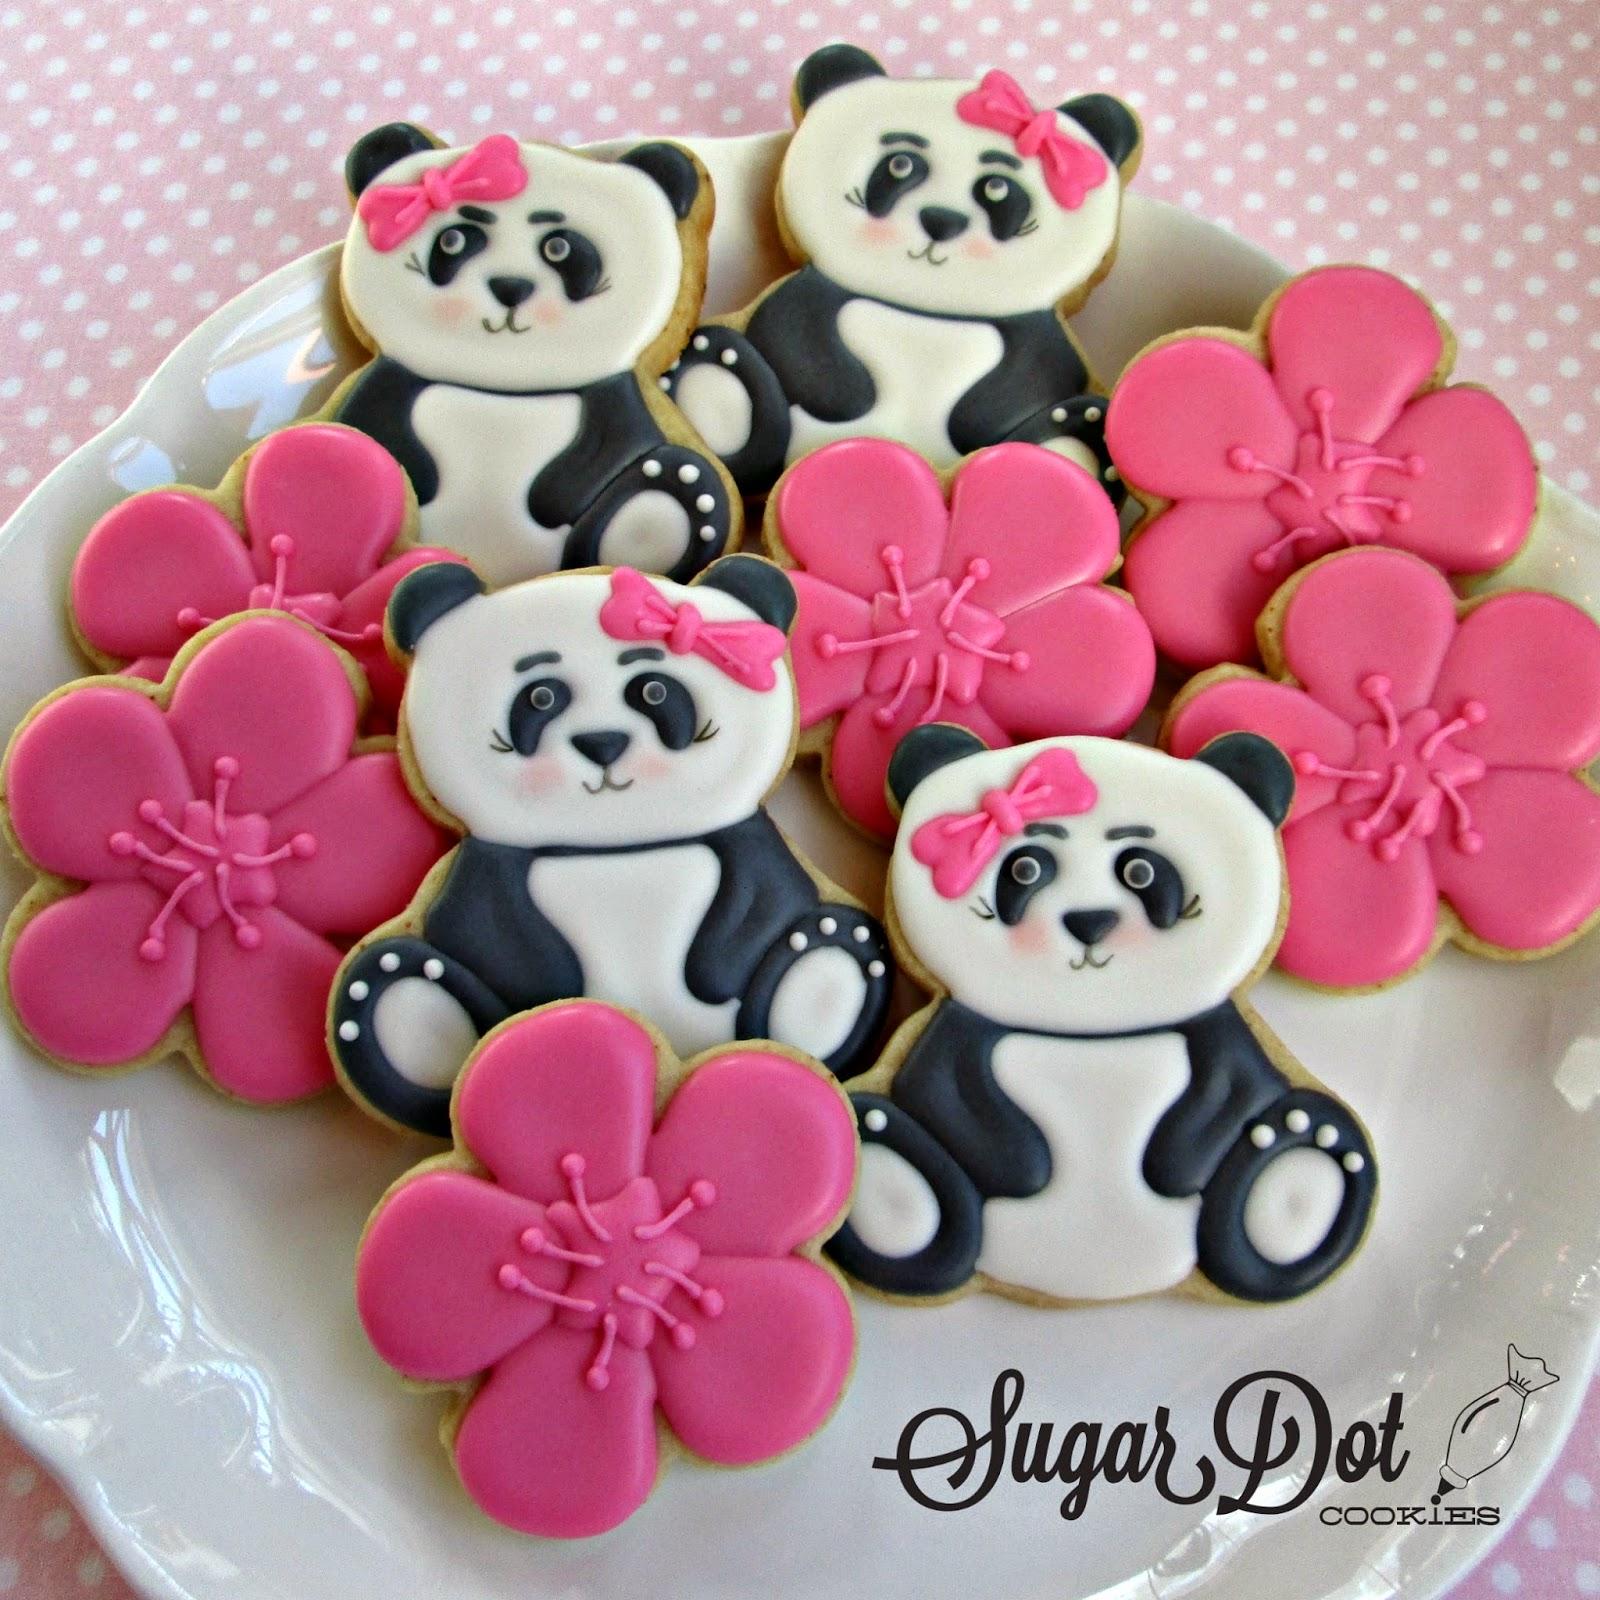 Sugar Dot Cookies: Lots of Panda Sugar Cookies